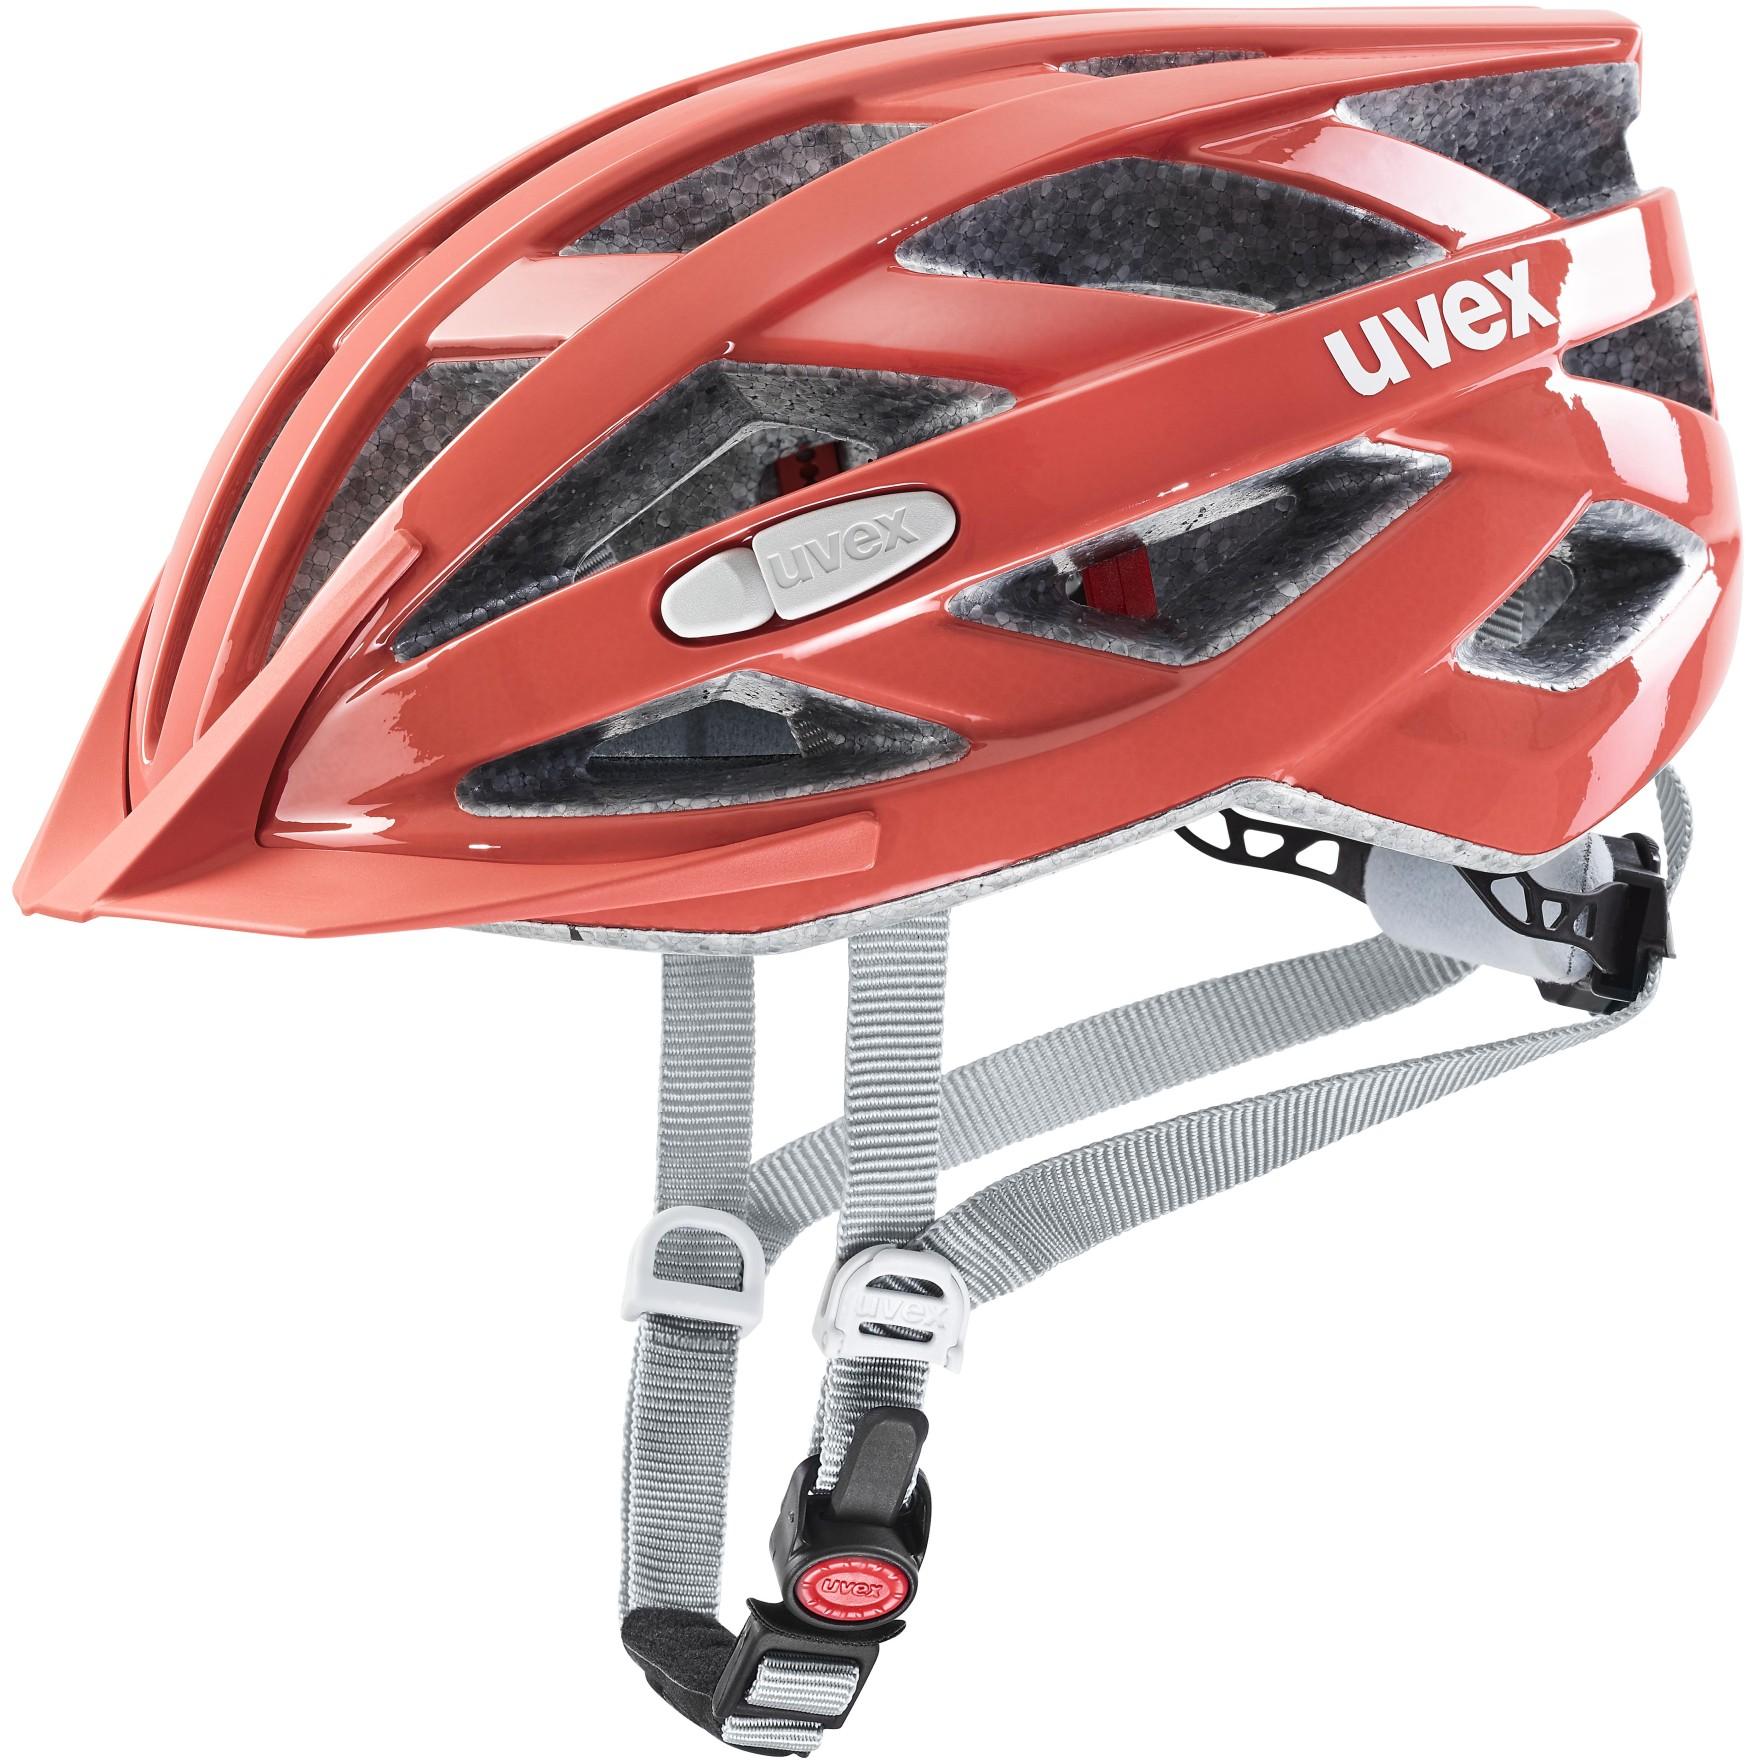 Image of Uvex i-vo 3D Helmet - grapefruit